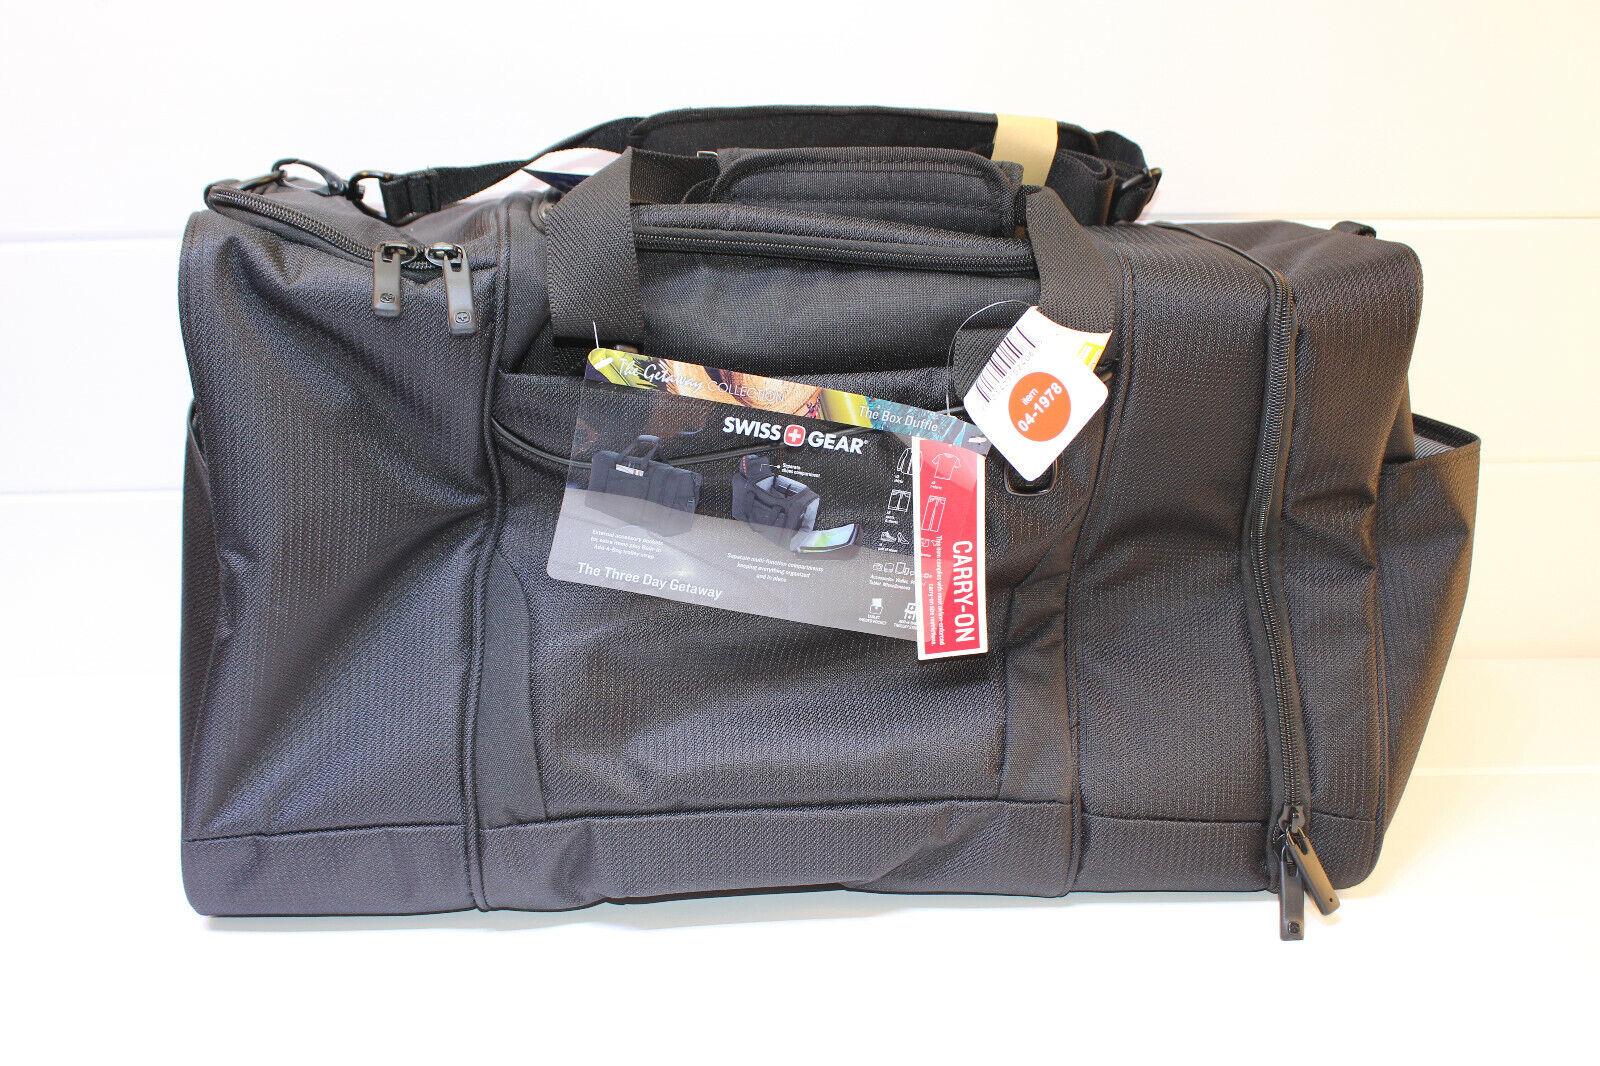 Swiss Gear Getaway Sport Duffel Bag NWT - $70.36